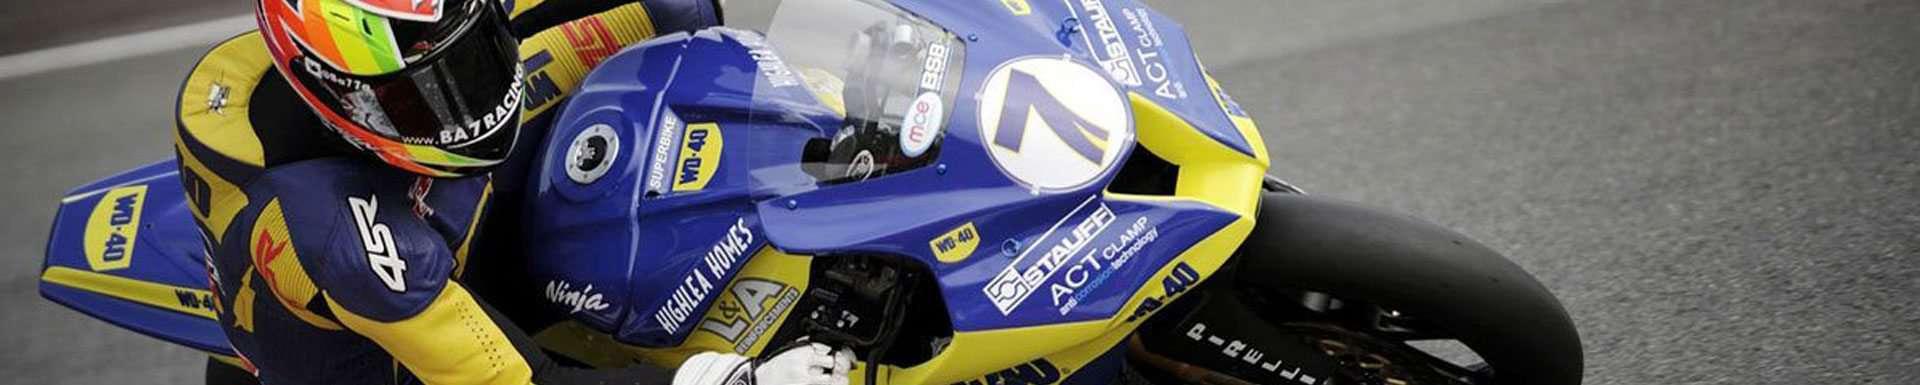 specialist motorbike